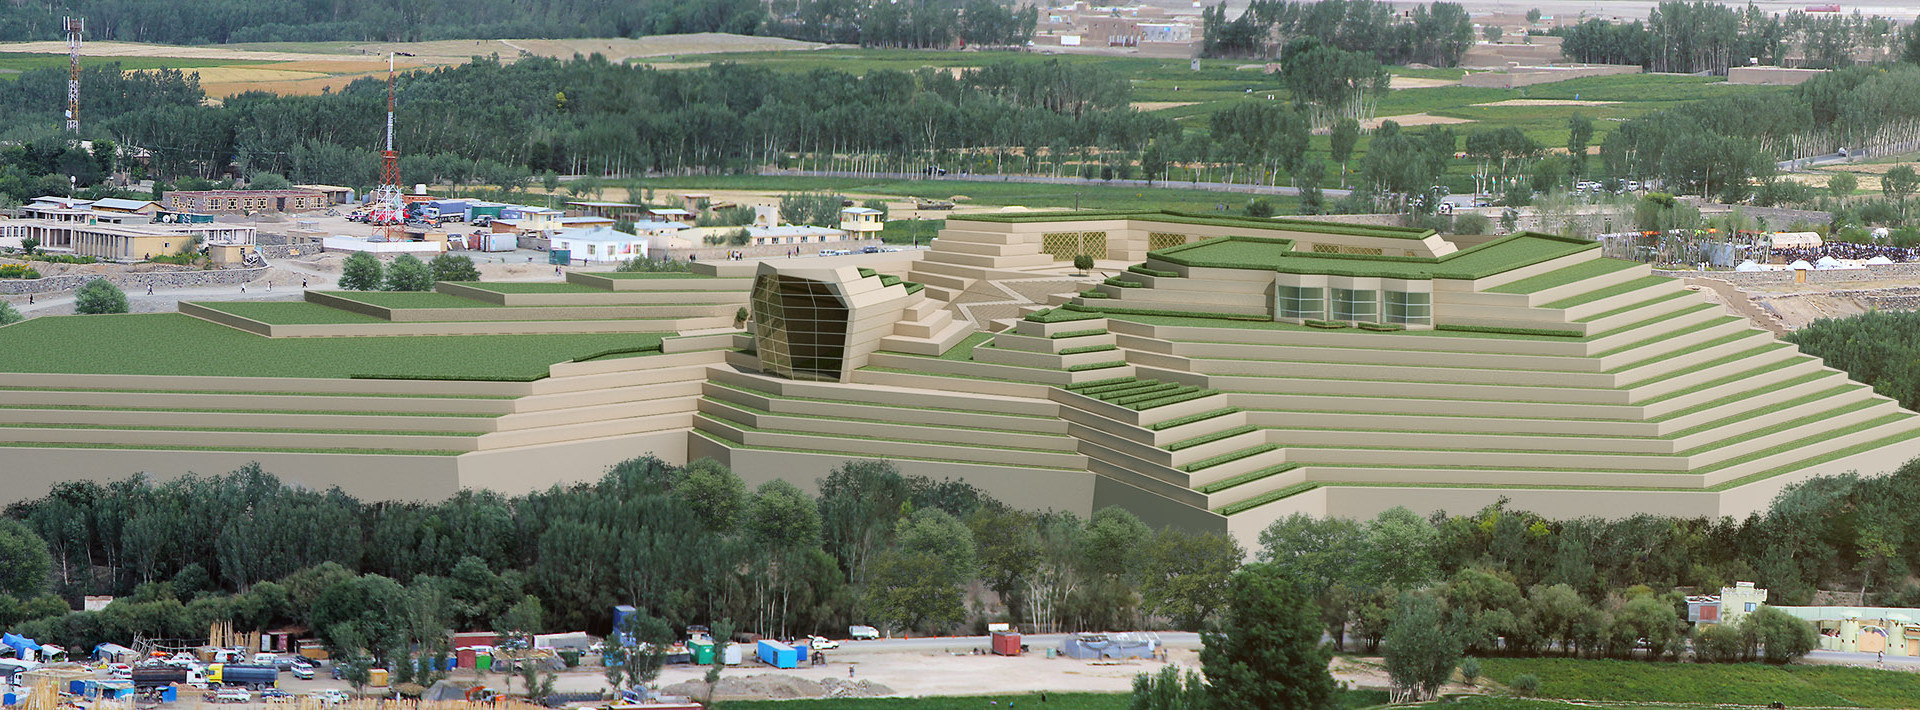 Bamiyan Cultural Center Aerial Perspective